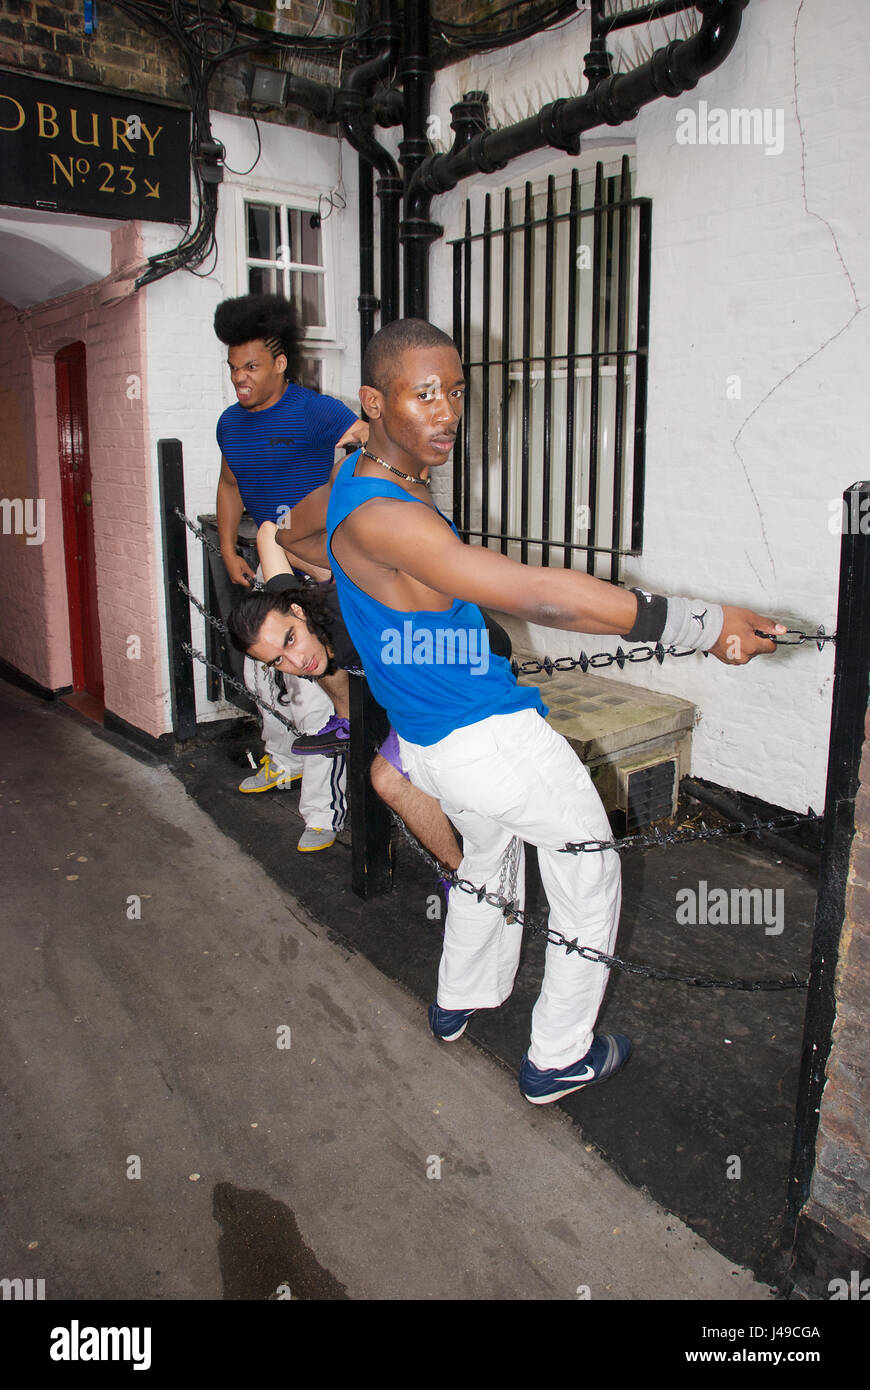 male stripper training